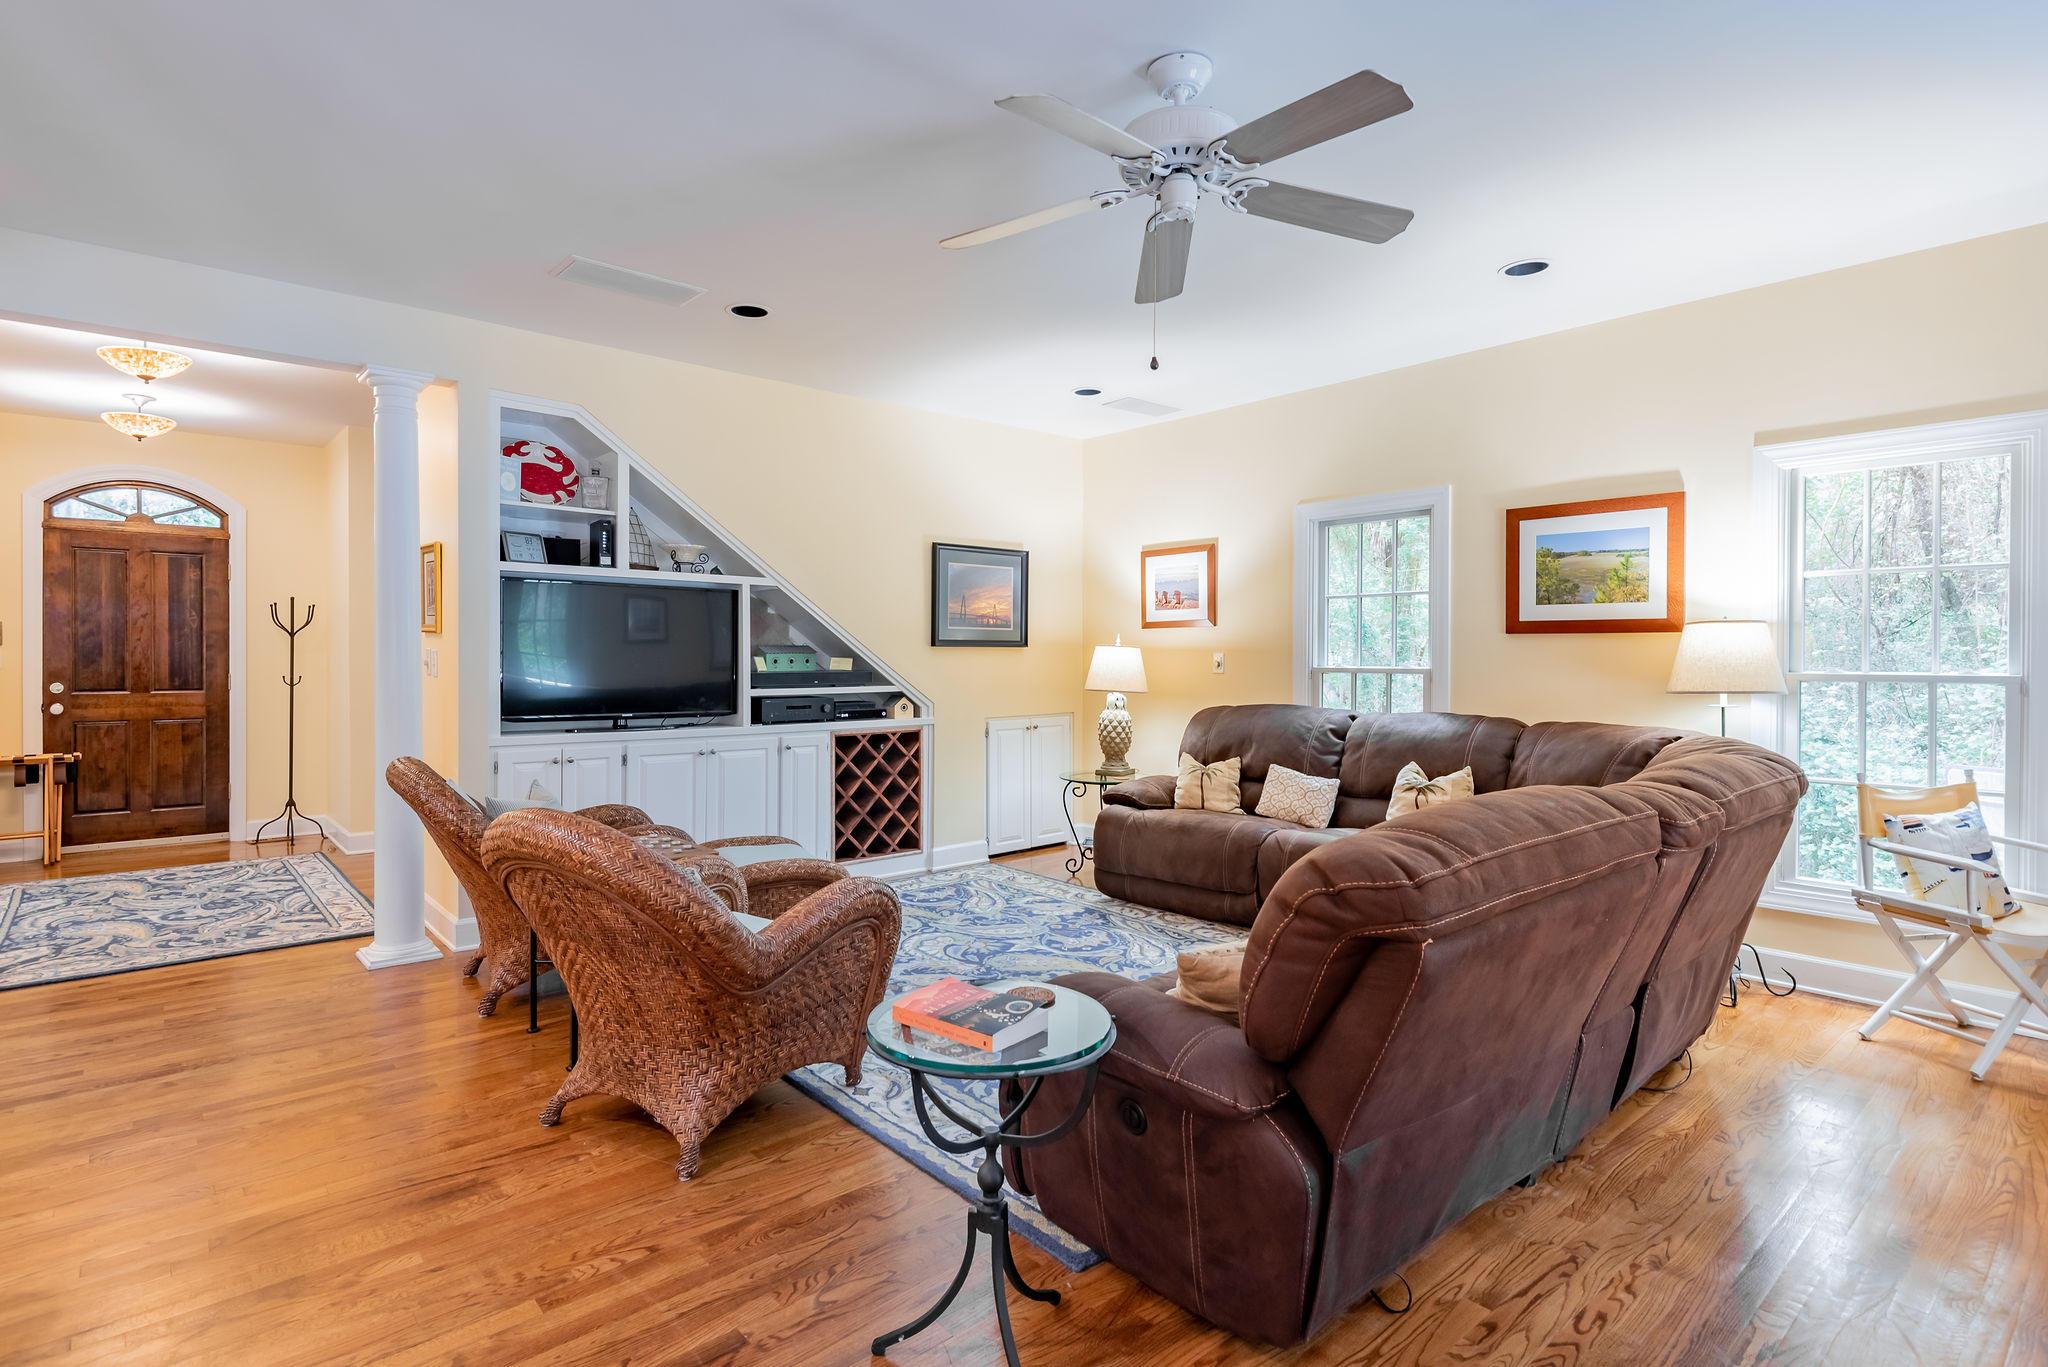 Kiawah Island Homes For Sale - 134 Conifer, Kiawah Island, SC - 15